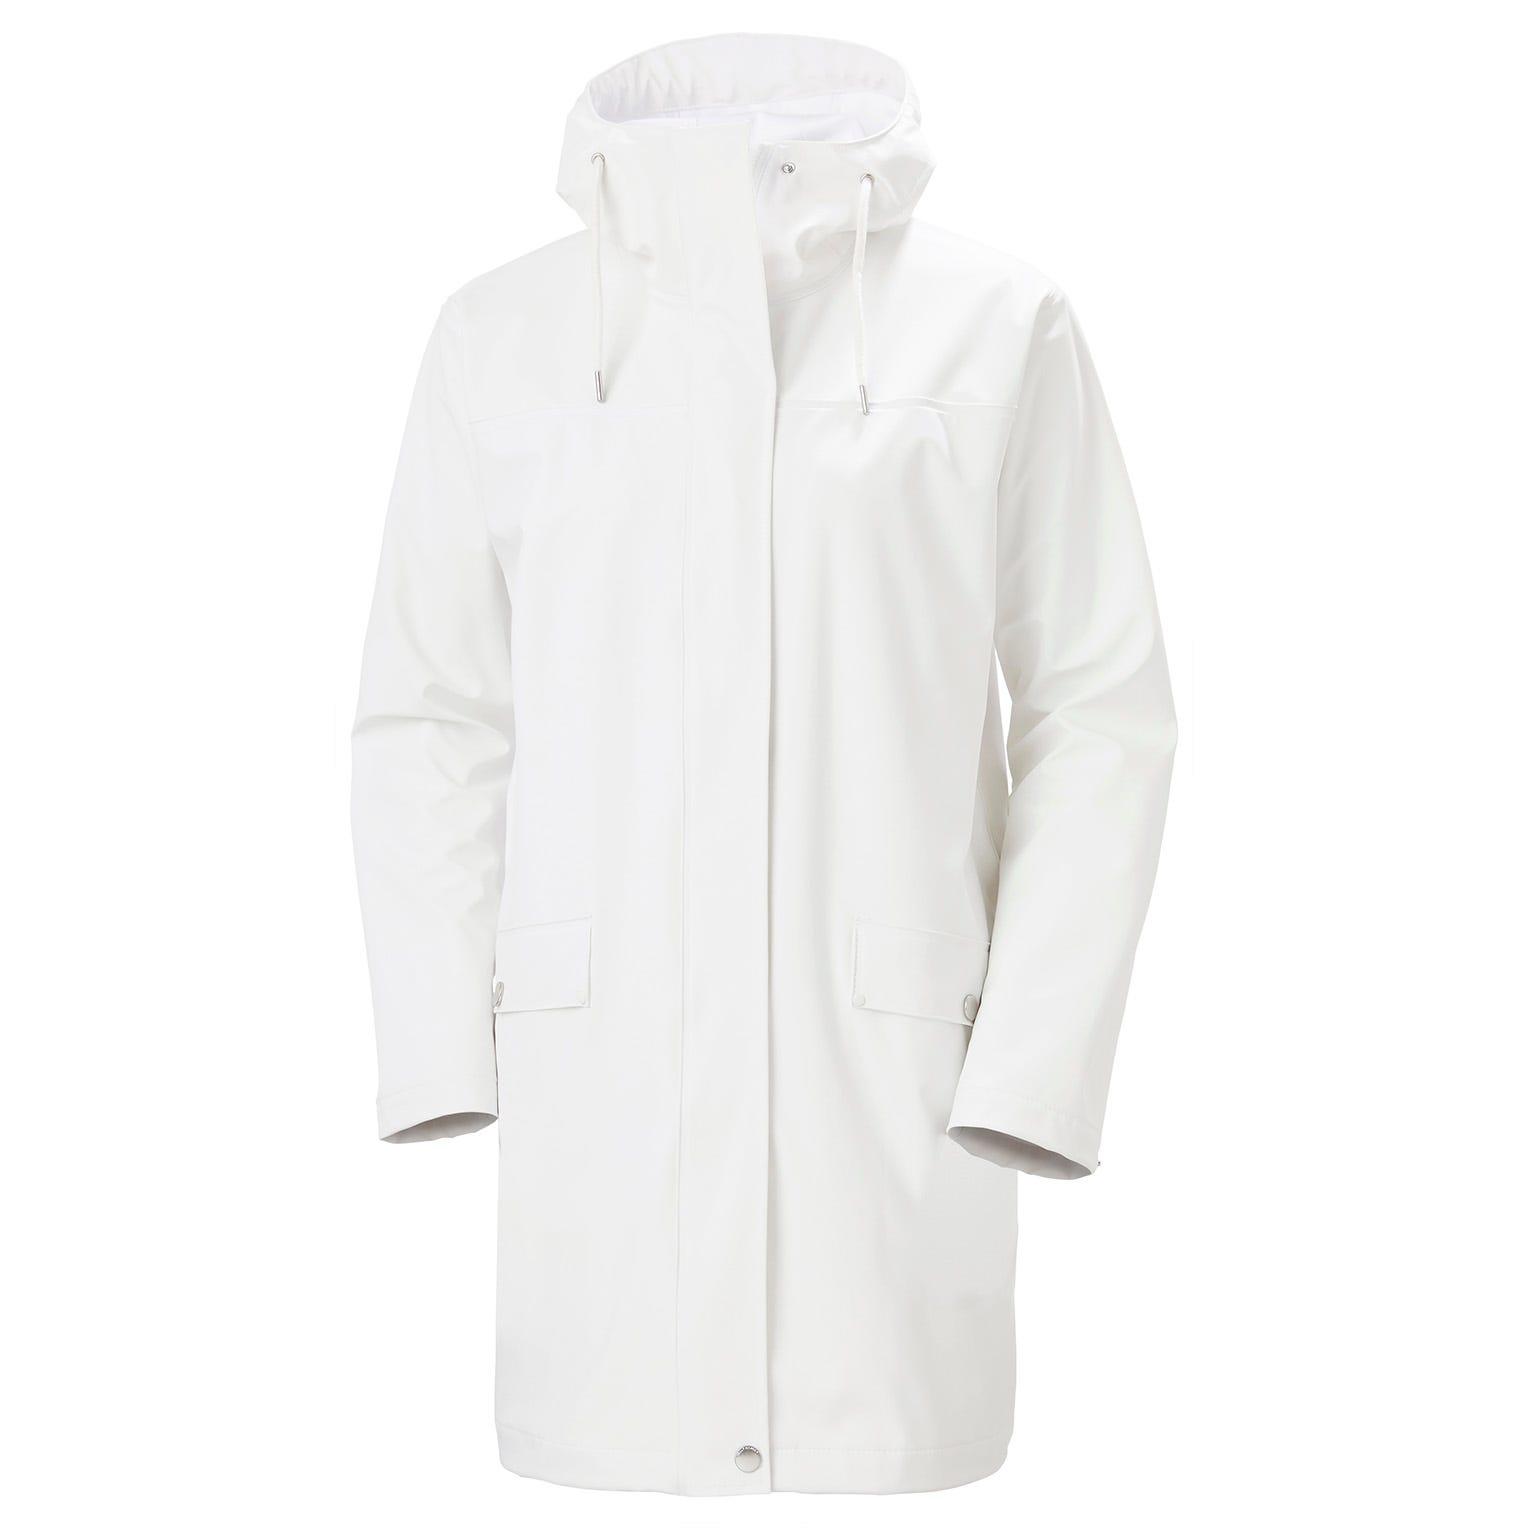 Womens Moss Waterproof Rain Coat | Helly Hansen Womens Jacket White XL